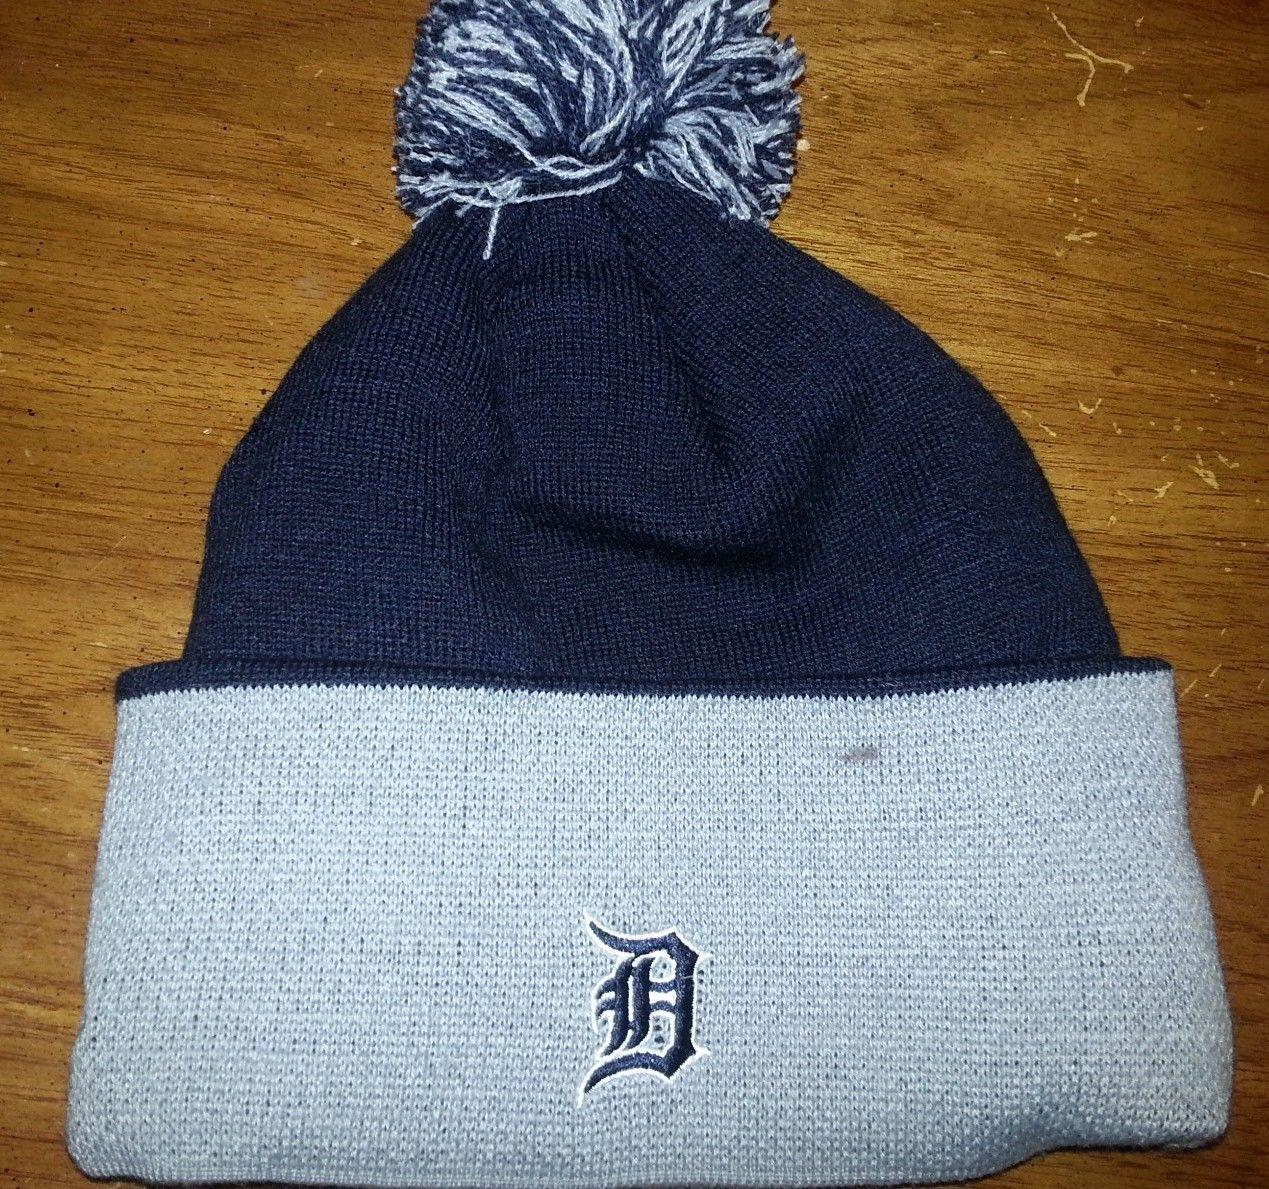 new style f7e1e 0758c NEW MLB New ERA Knit CUFFED BEANIE HAT CAP Pom POM Variety of Teams YANKEES